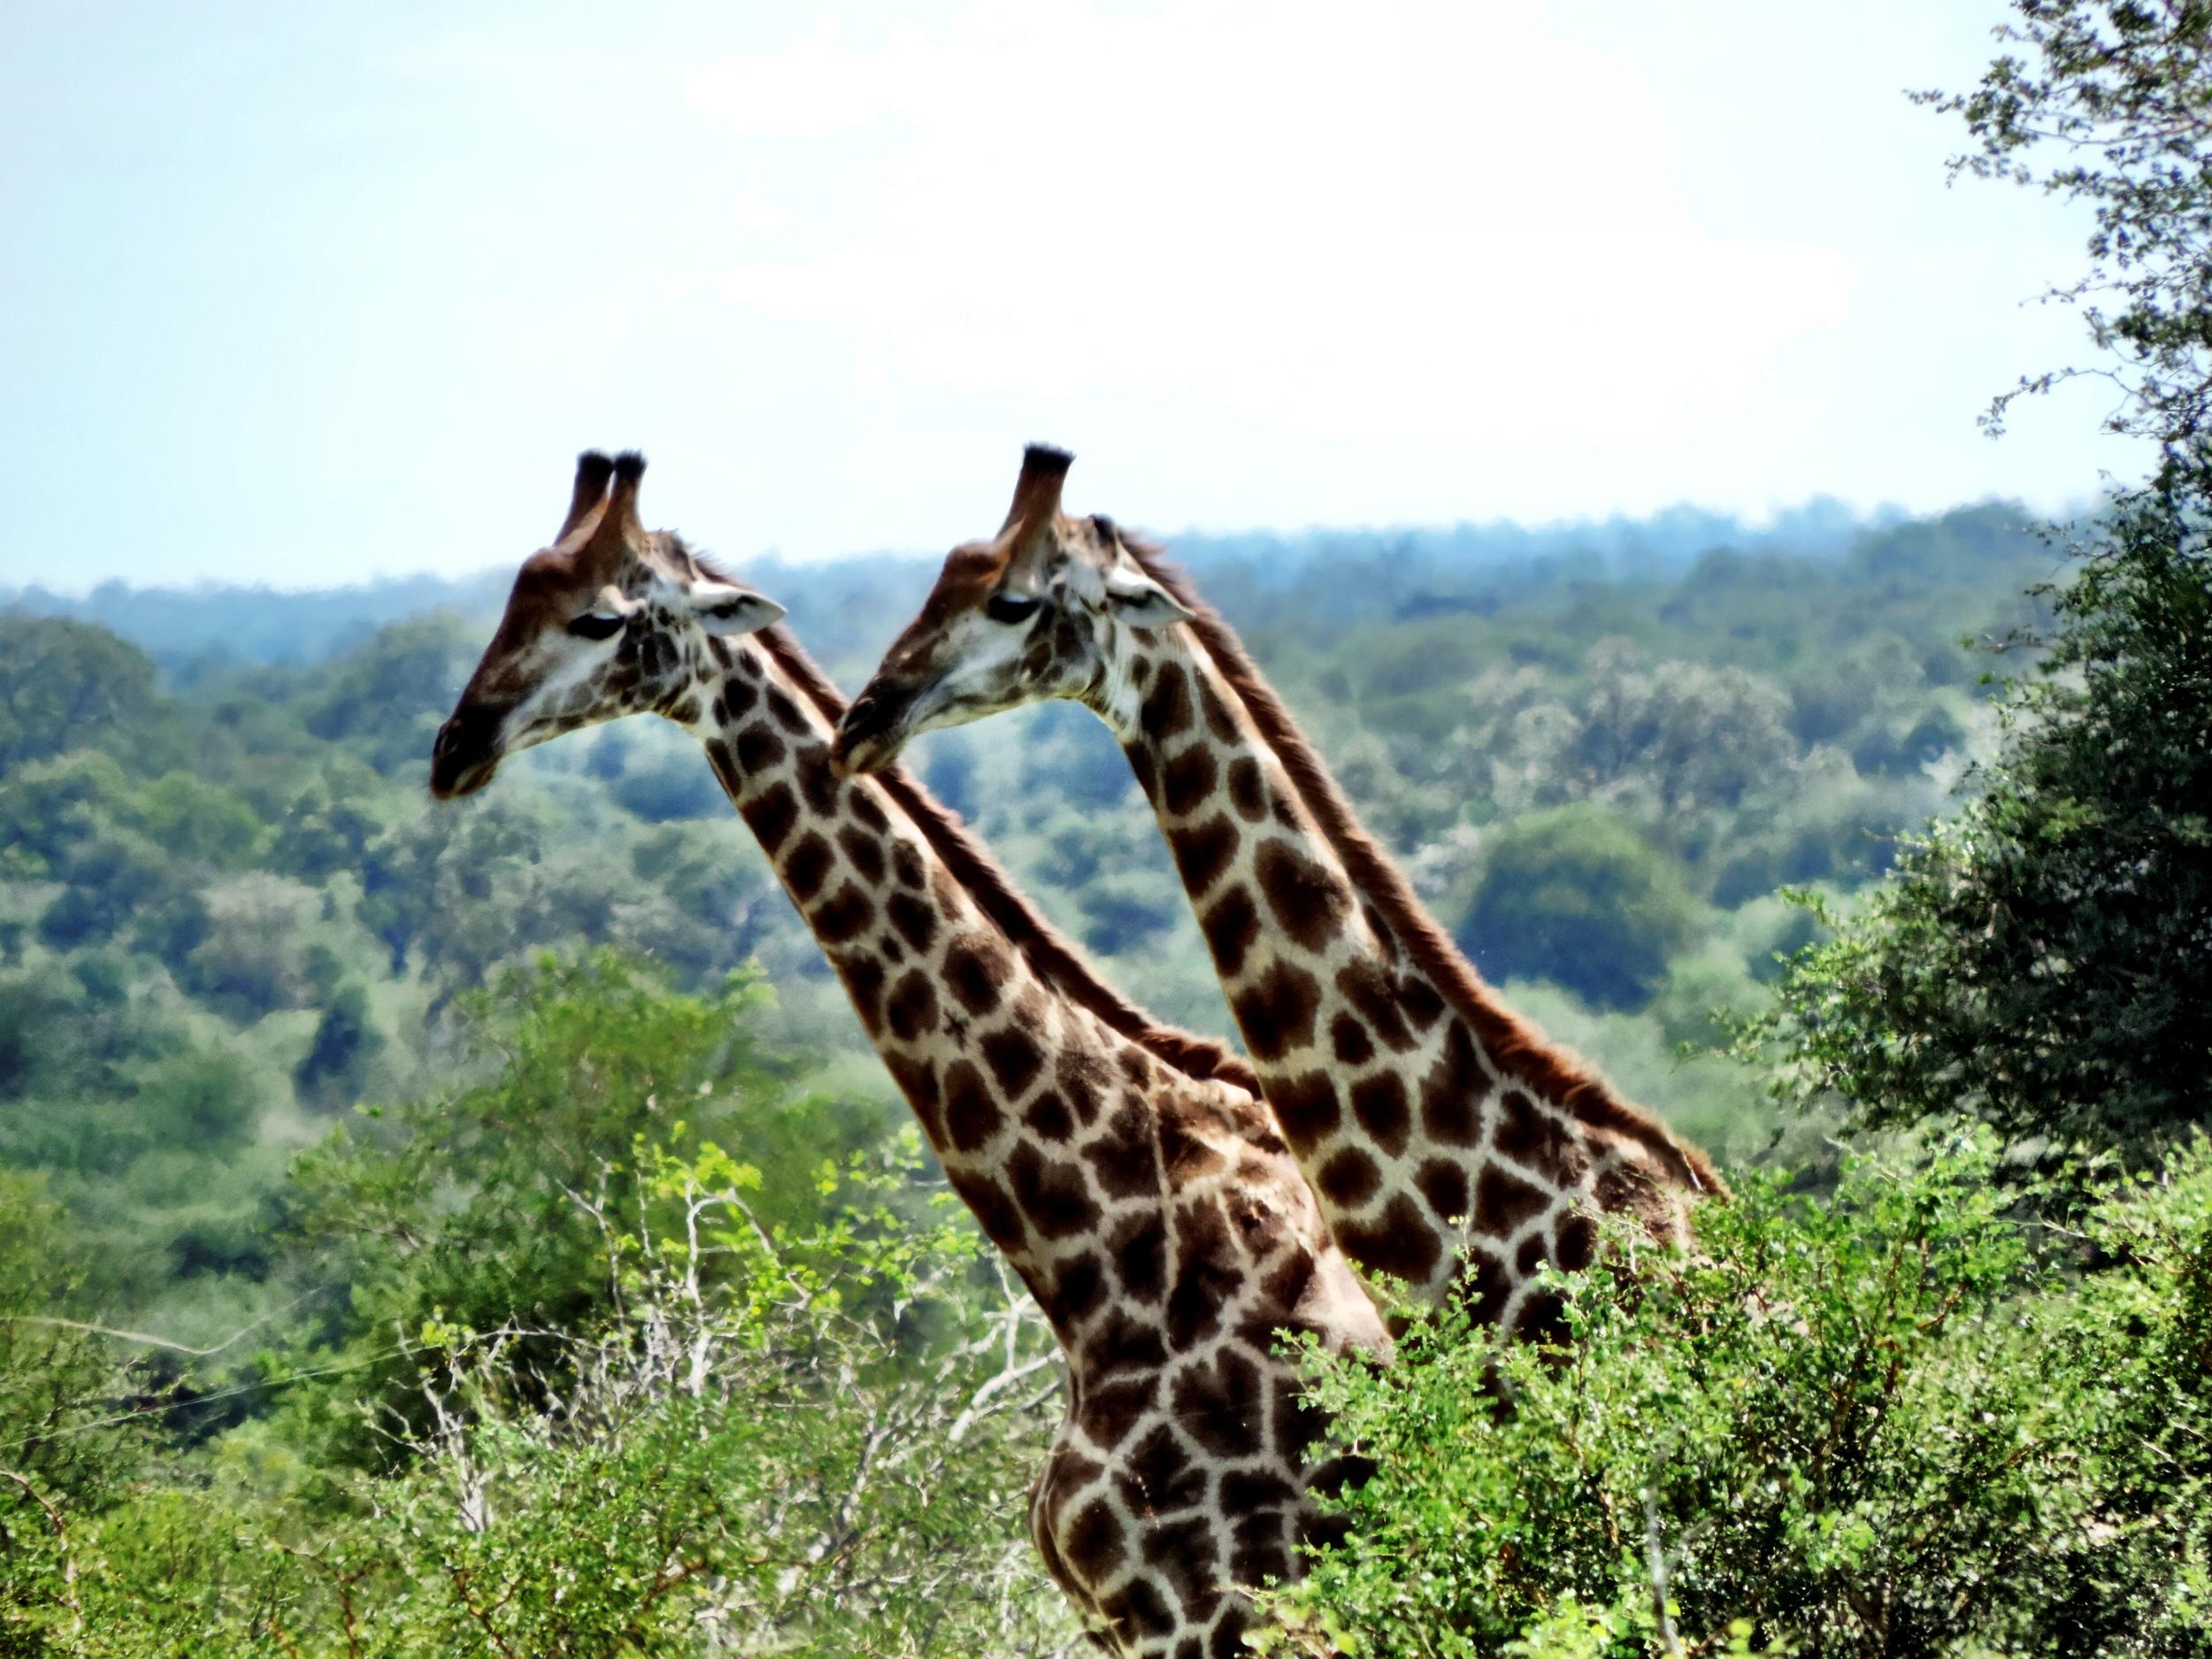 Giraffes at Kruger National Park in South Africa